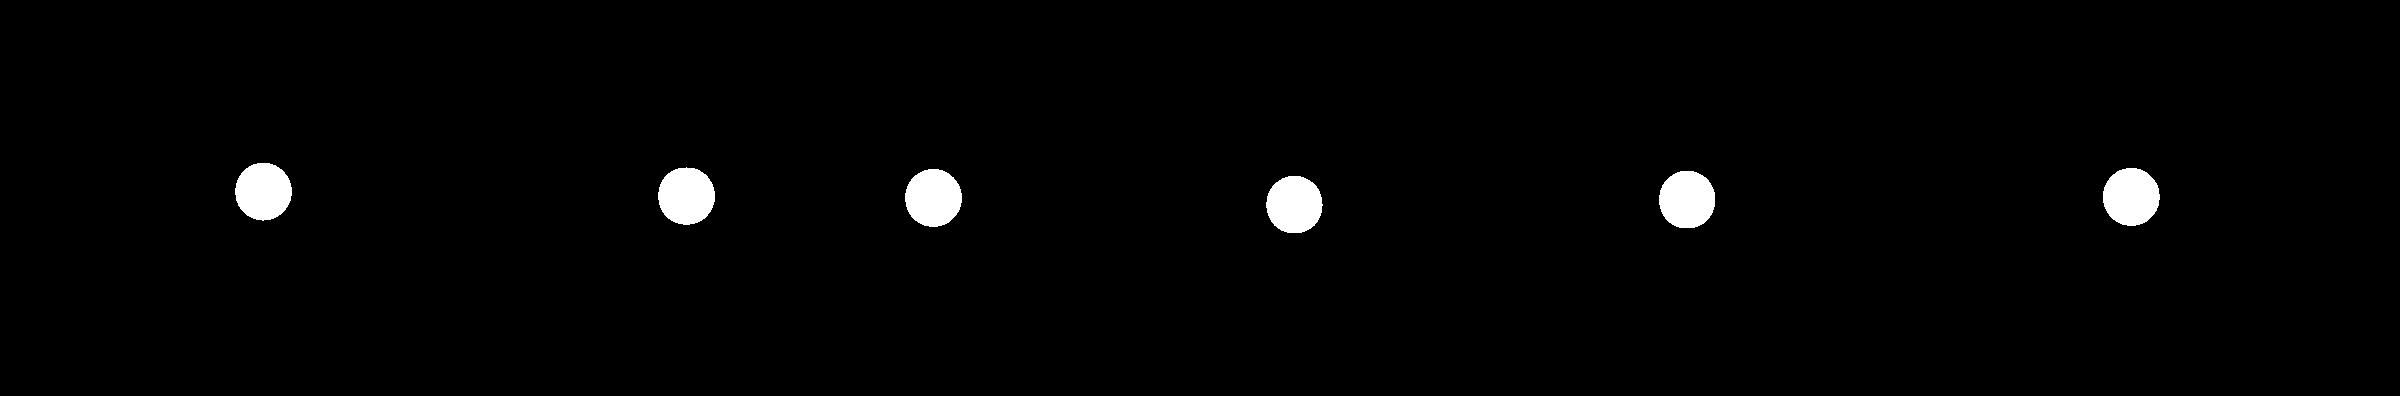 Friends logo black and white